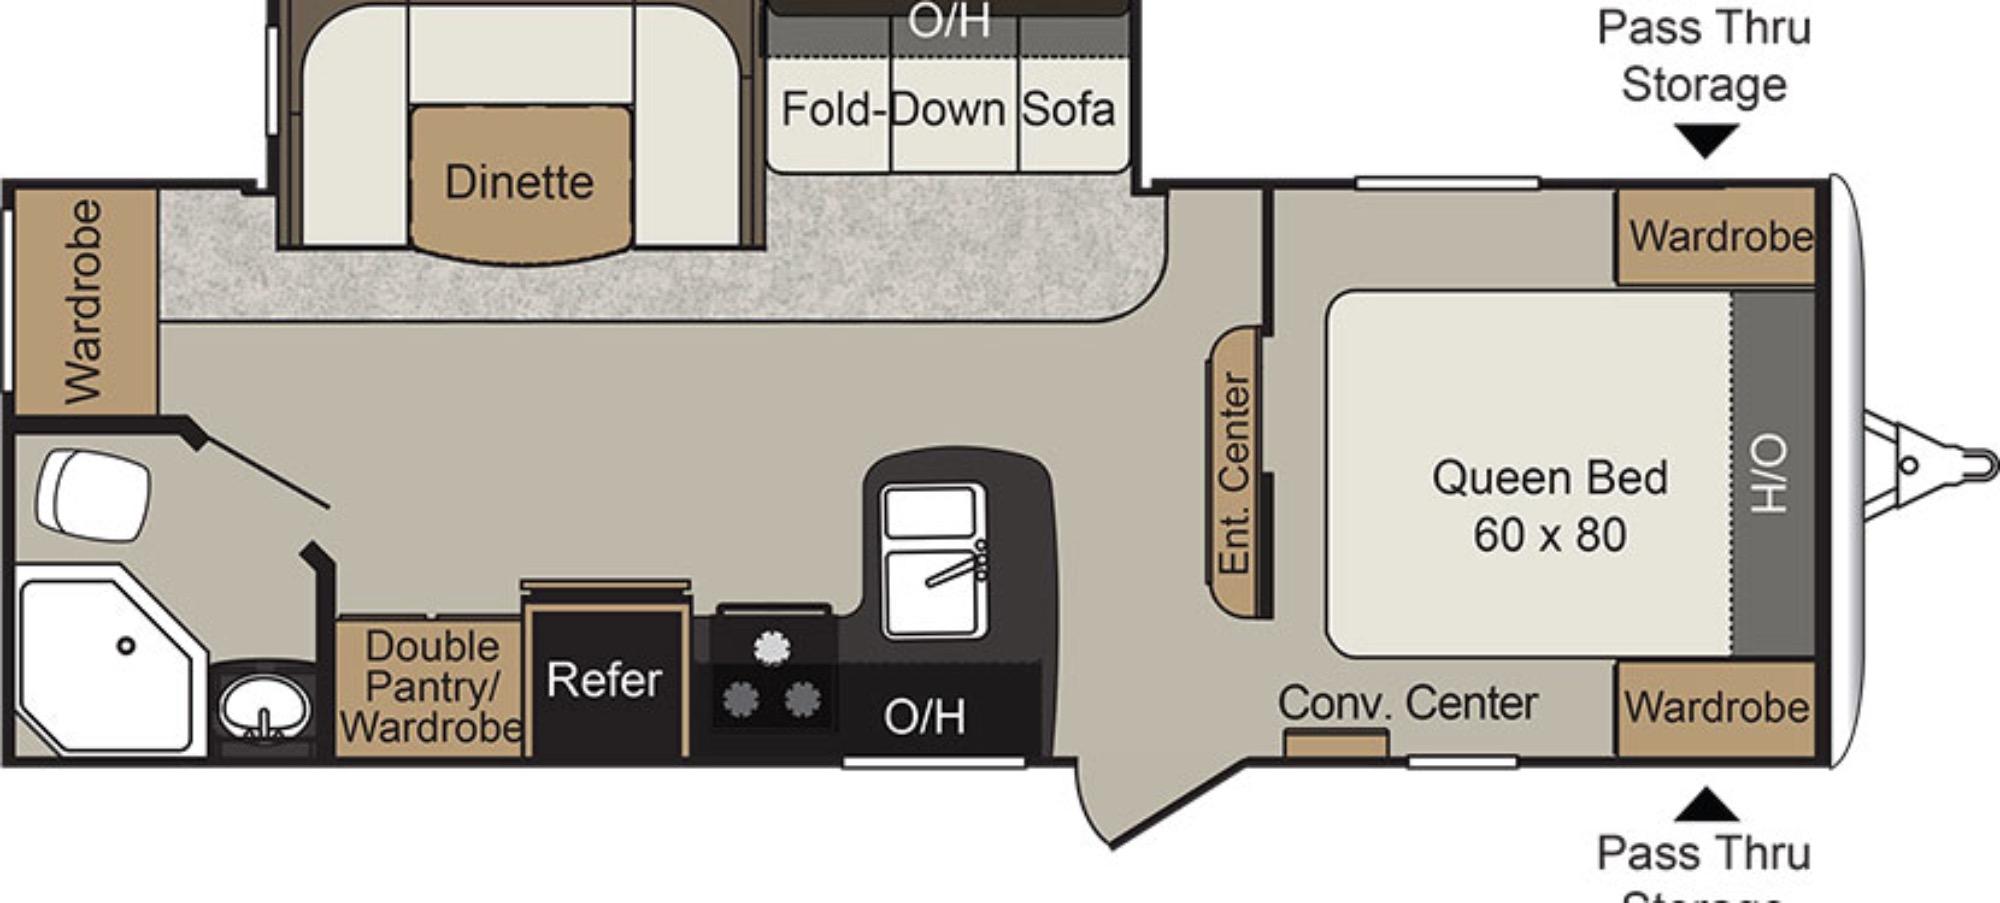 View Floor Plan for 2018 KEYSTONE PASSPORT 2510RB